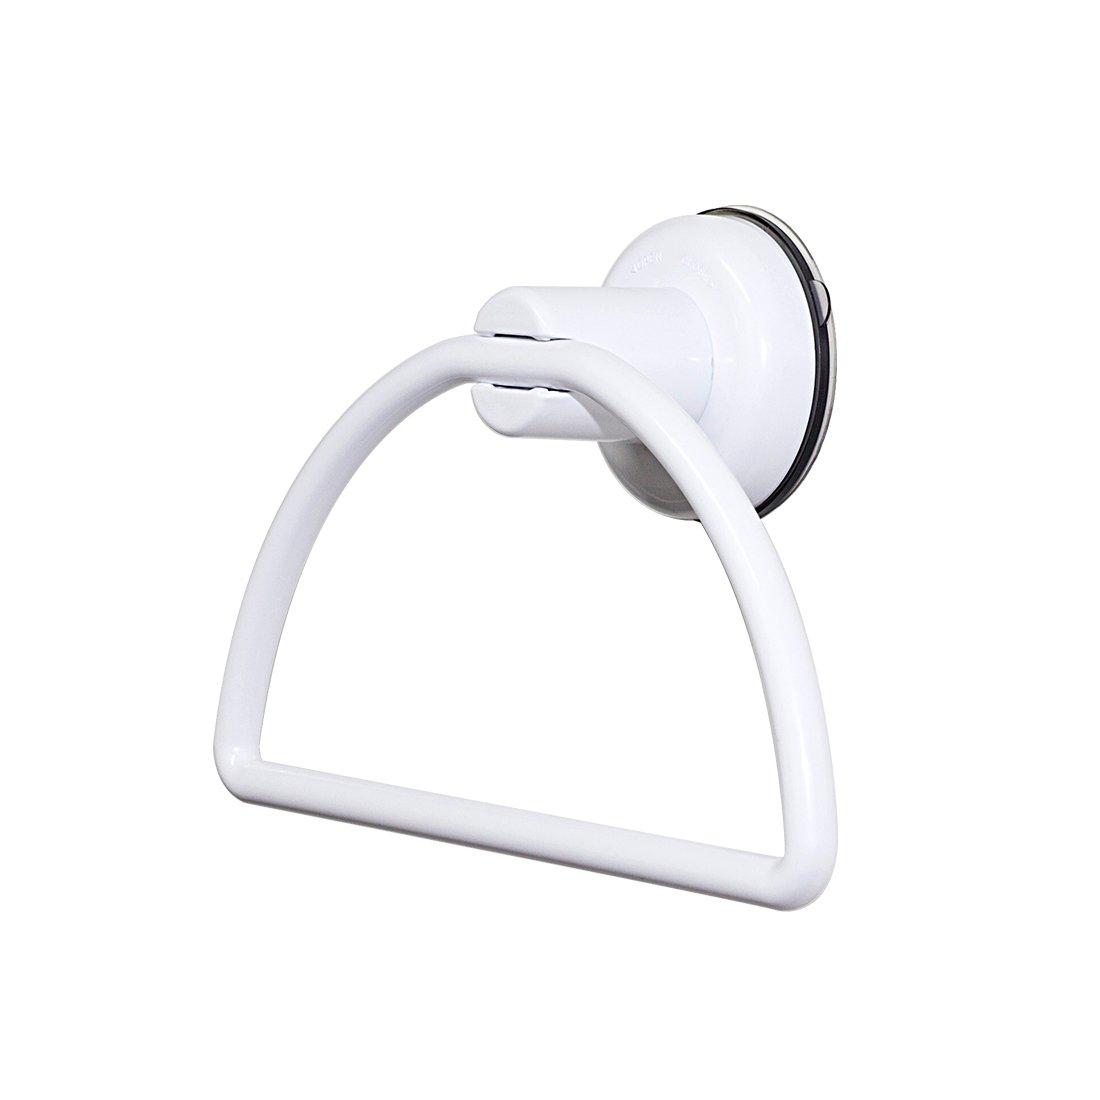 IMAHOU Bath Towel Holder Hand Towel Ring Hanging Towel Hanger Bathroom Accessories Wall Mount